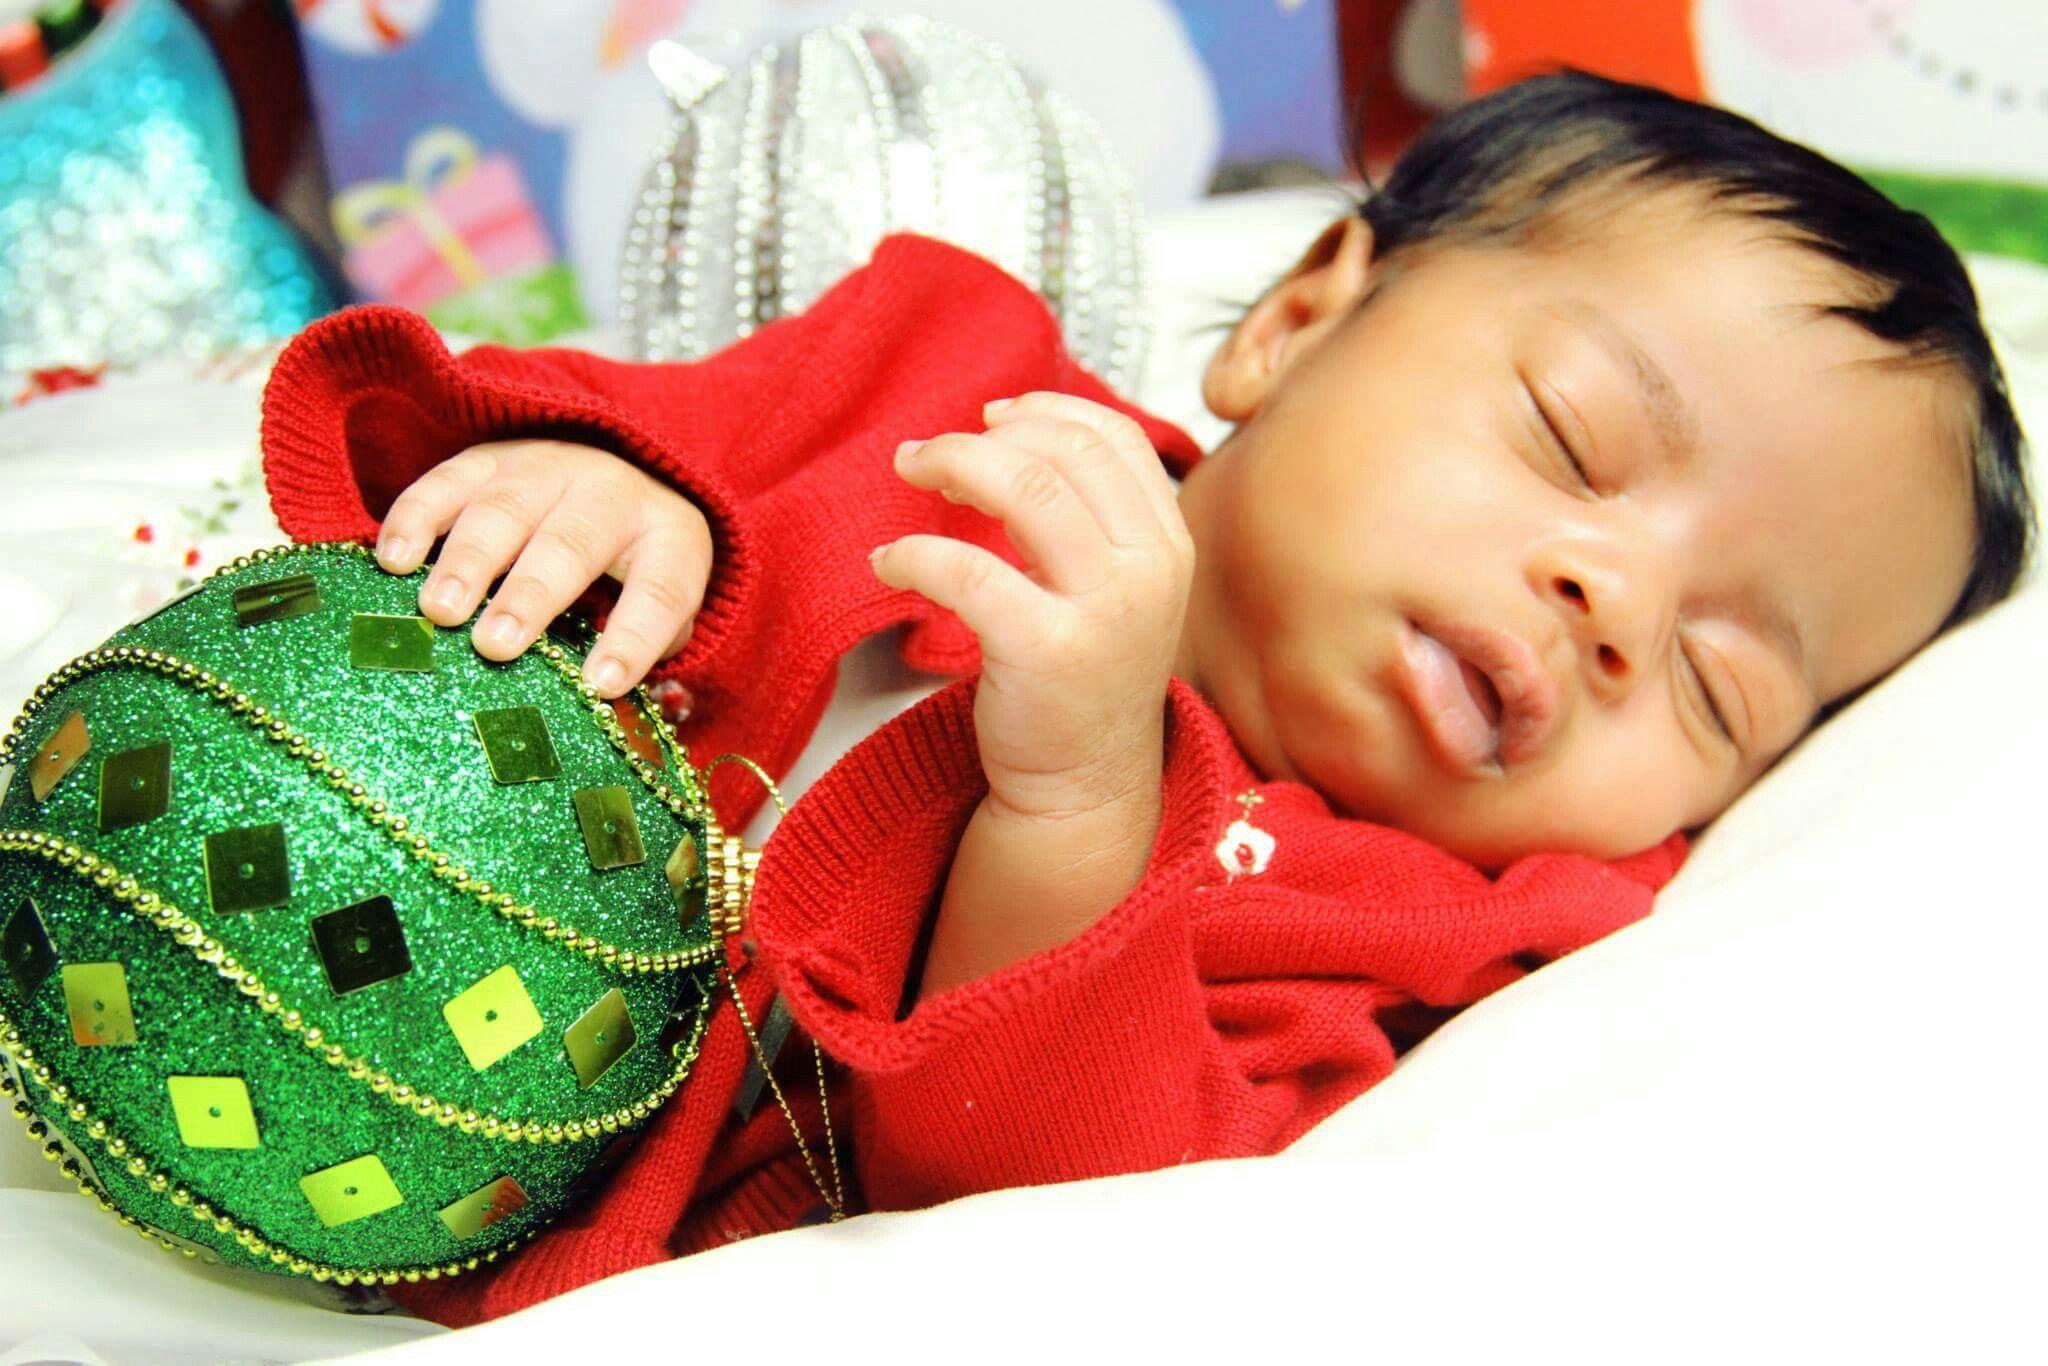 Baby holiday photography black babies african american baby girl christmas sleeping baby newborn photography